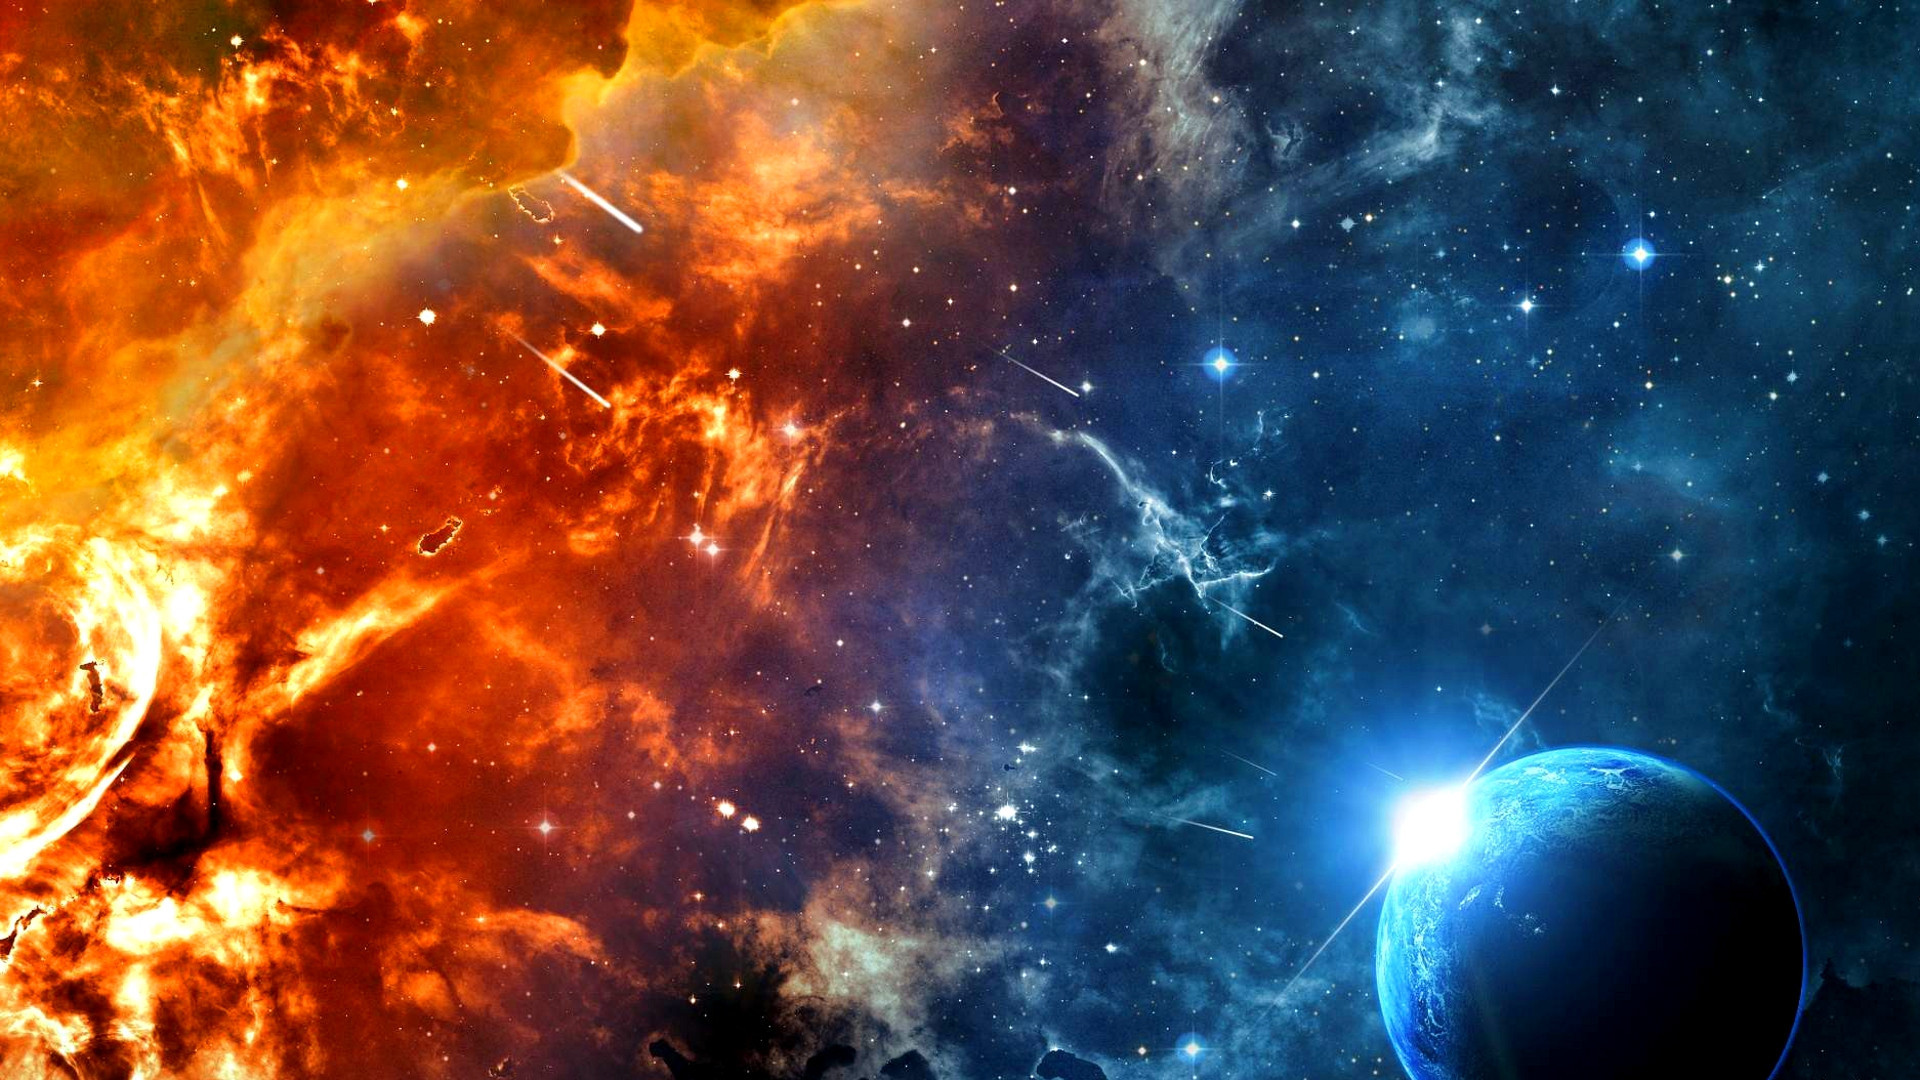 Heaven vs Hell Wallpaper Heaven And Hell Wallpaper